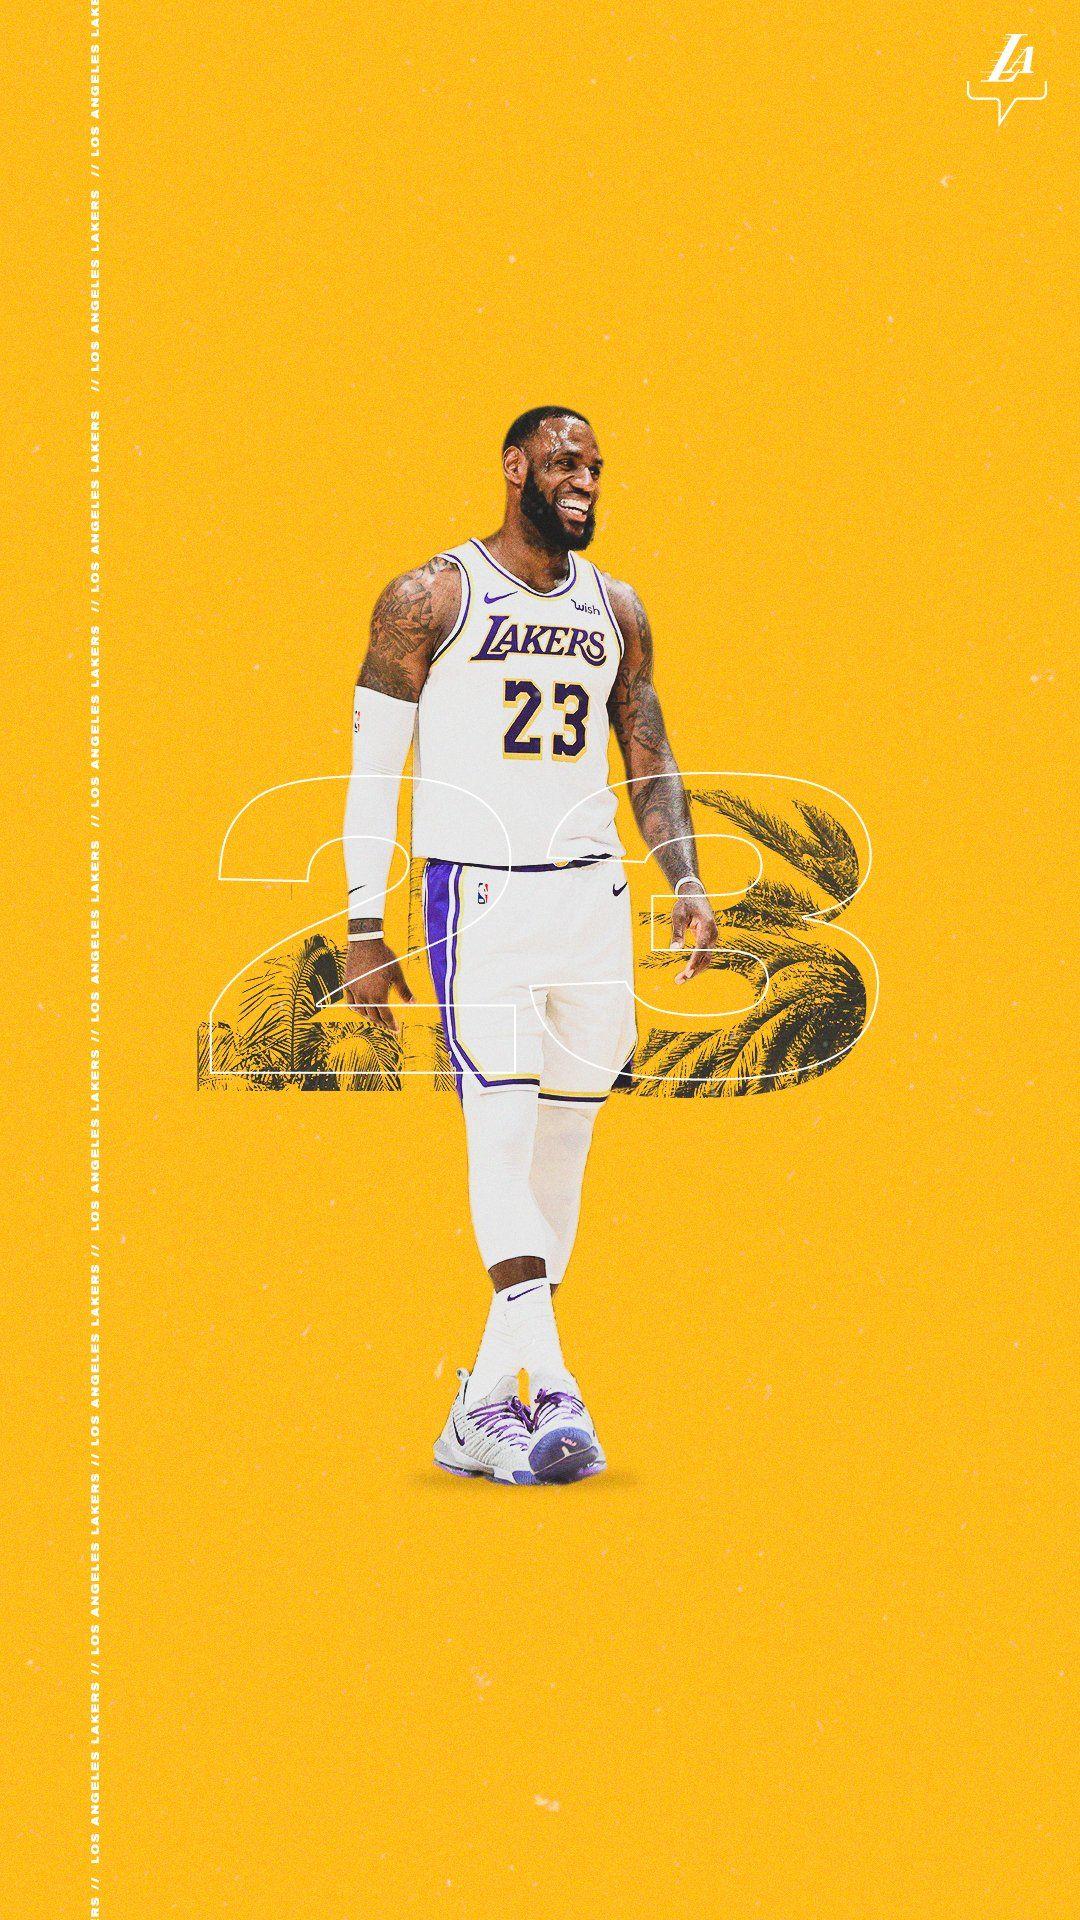 Twitter in 2020 Lakers hintergrundbilder, Lebron james